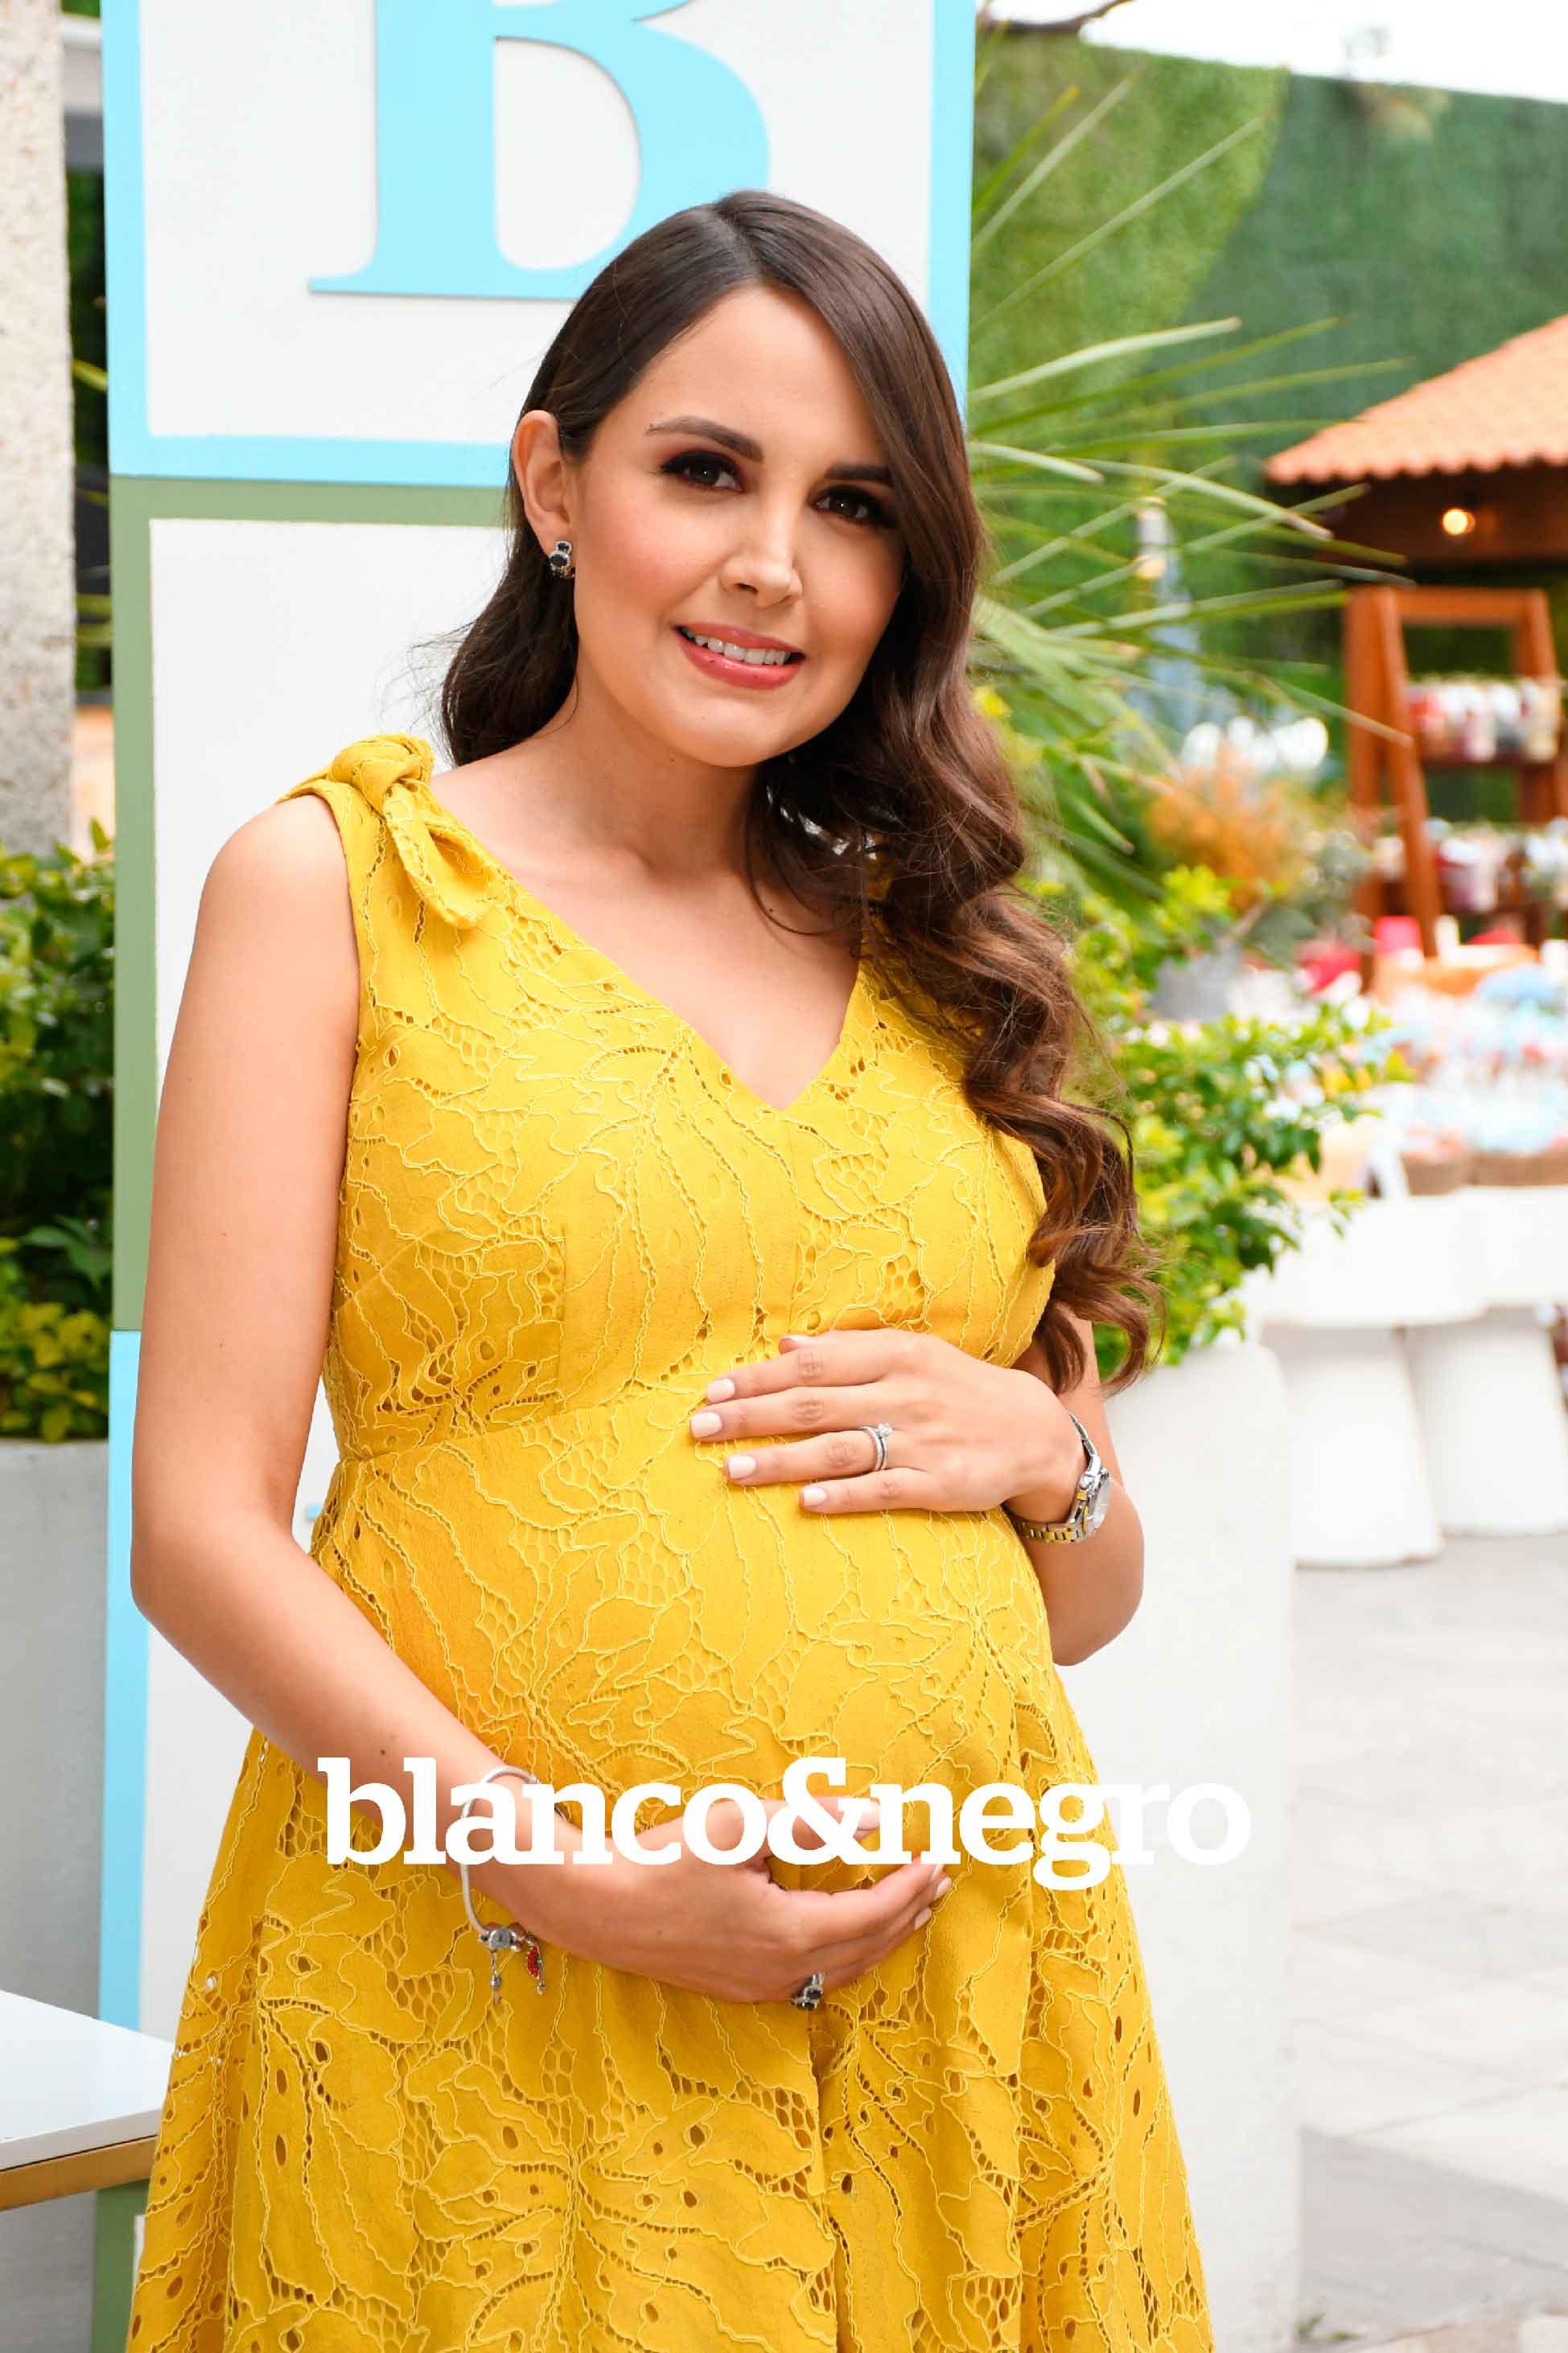 Baby-Victoria-021